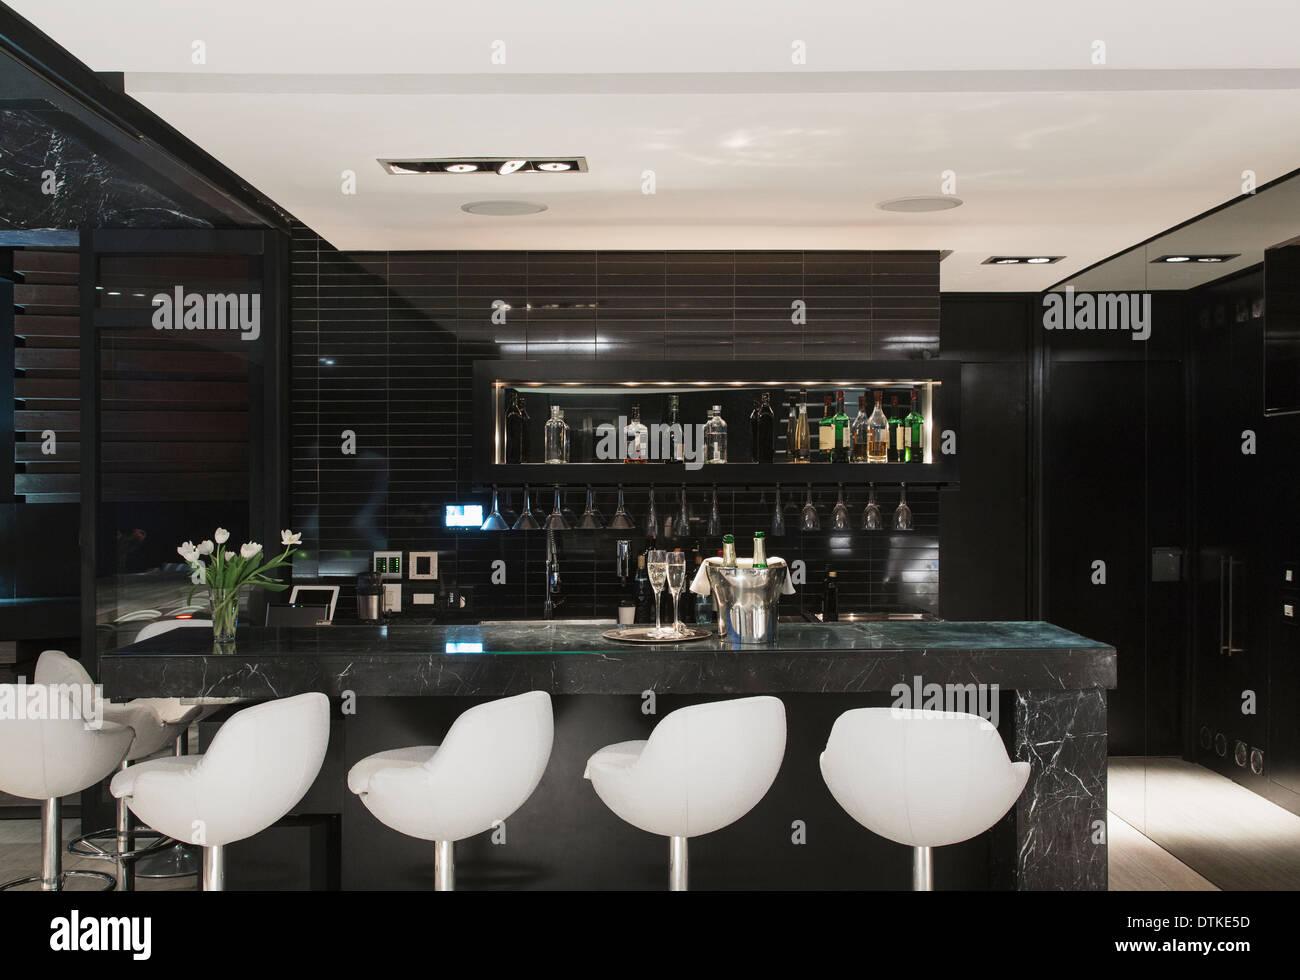 Sgabelli vuoti in bar foto & immagine stock: 66811065 alamy